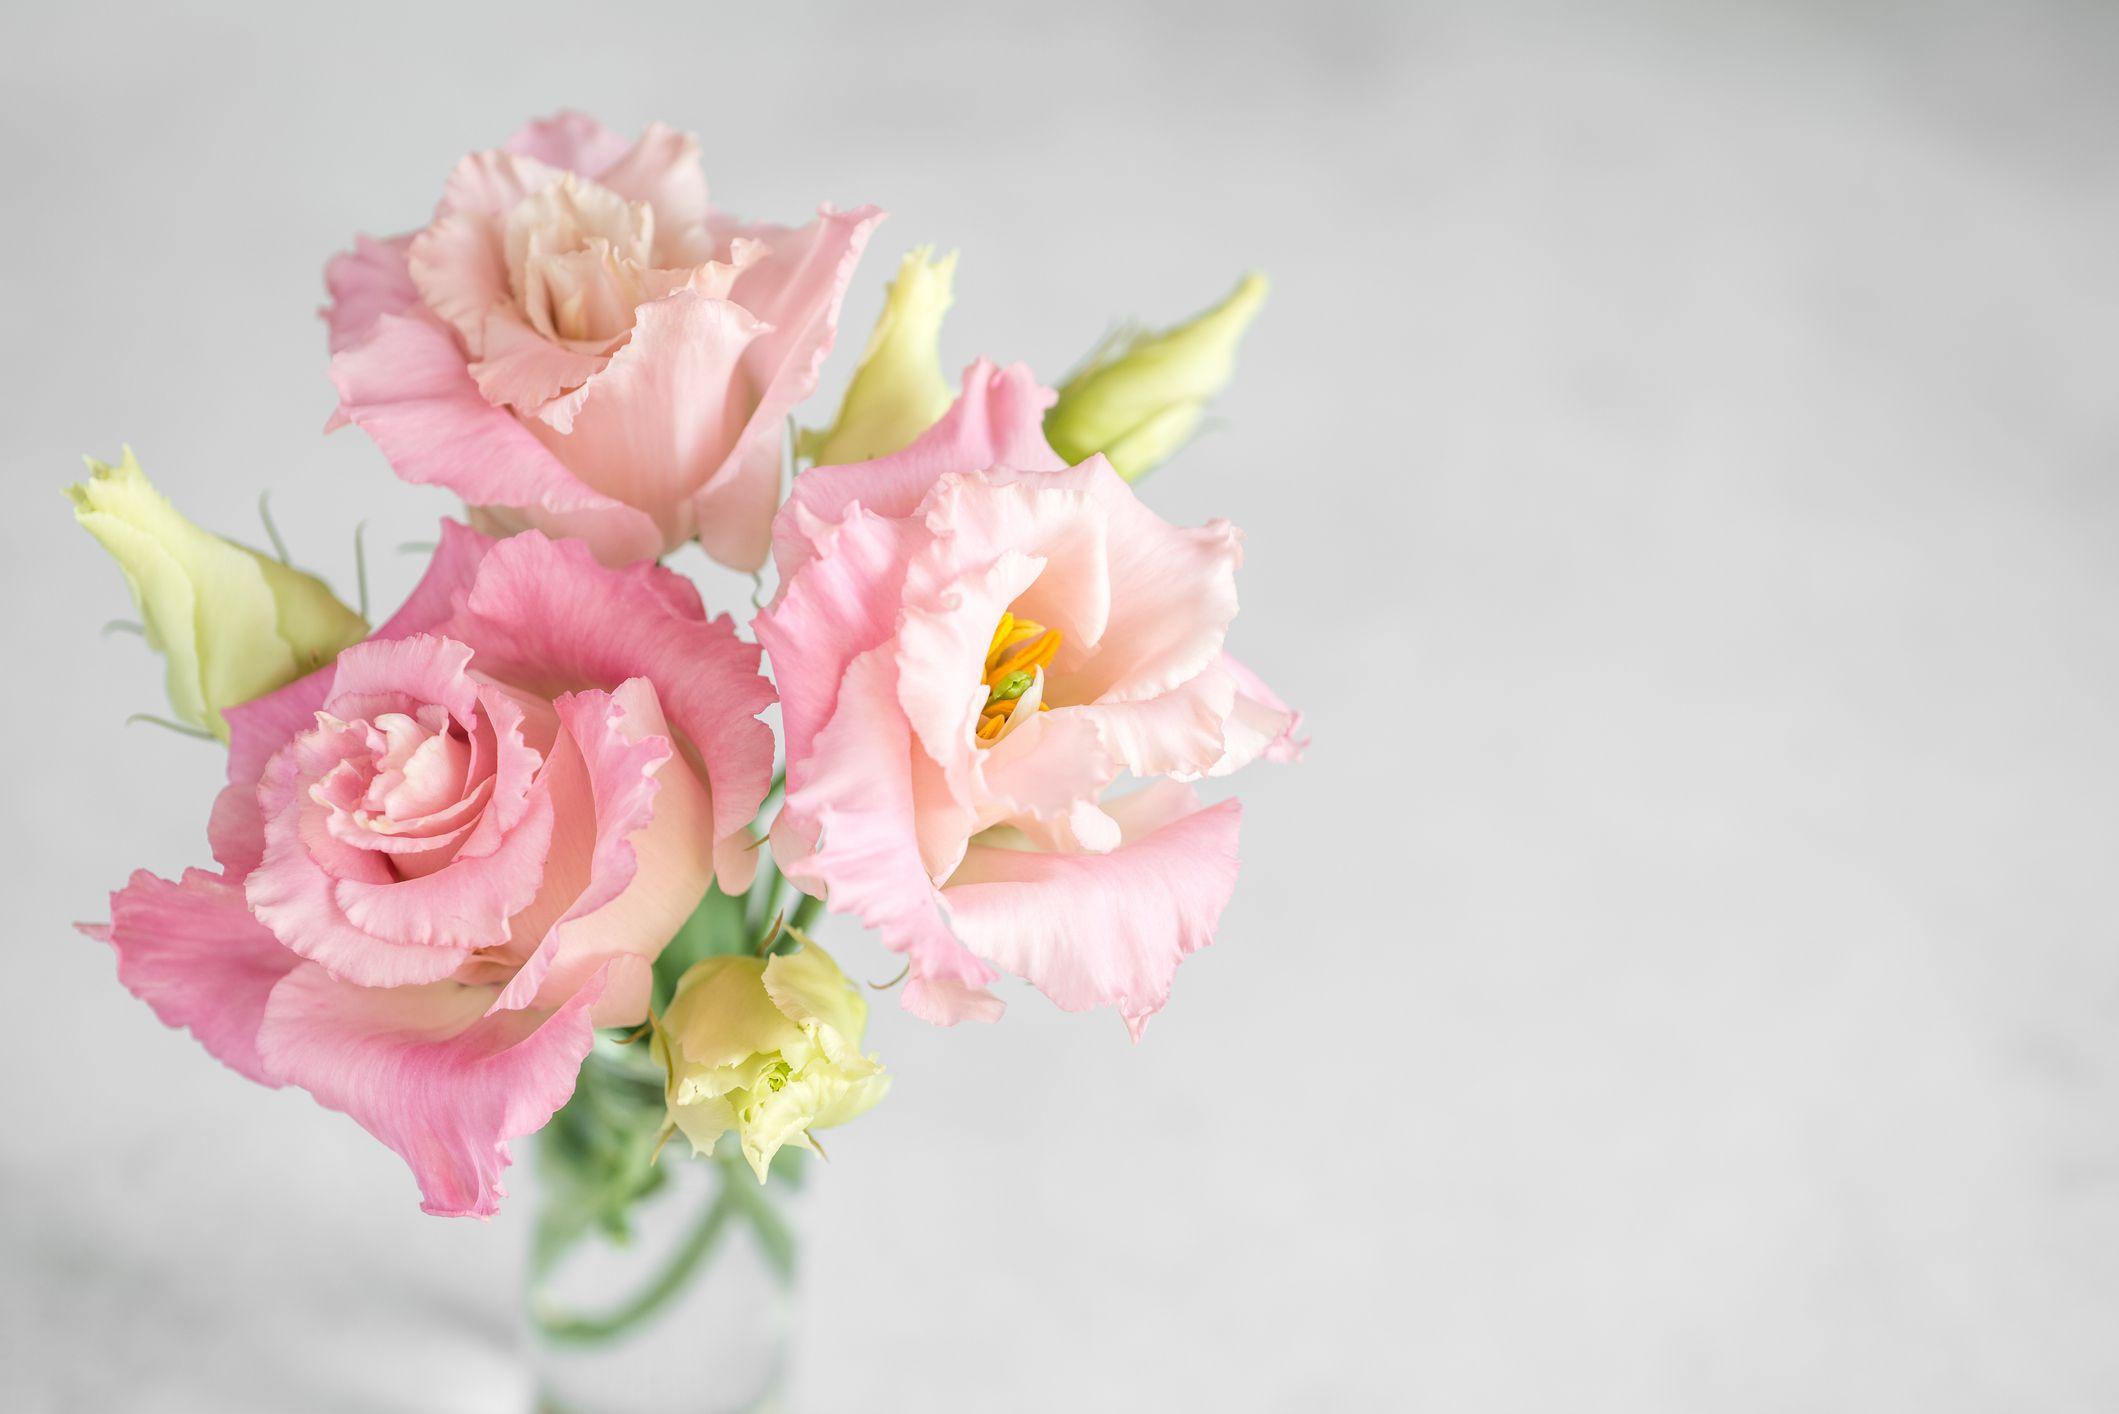 Fresh pink flowers of Lisianthus